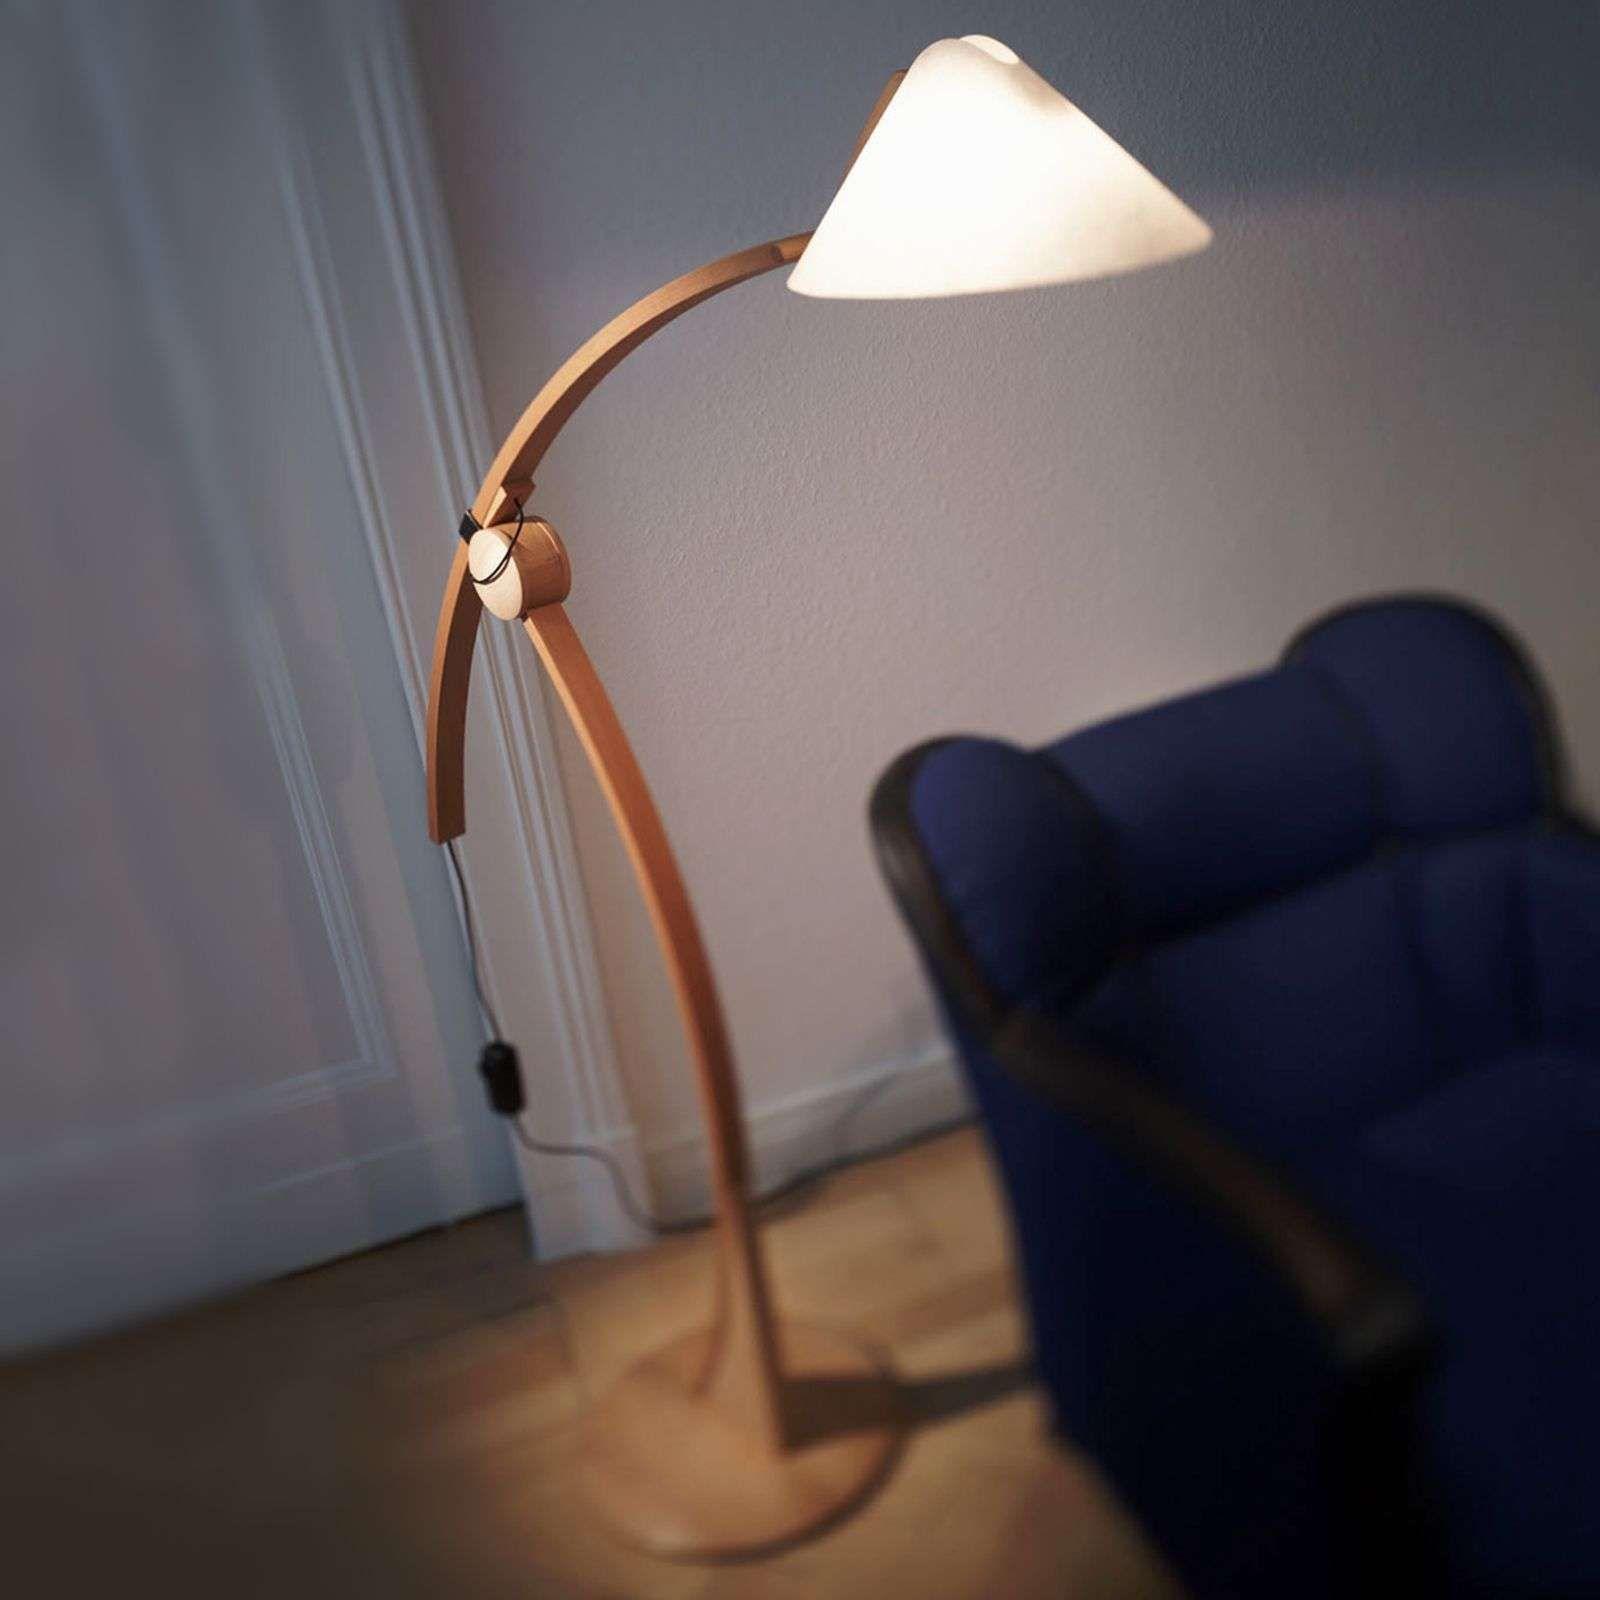 Led Lampe Ohne Kabel Pendelleuchte Wohnzimmer Lampensockel G9 Deckenlampe Flur Lang Badezimmer Wandleuchte Led Lampe Stehlampe Designer Stehleuchten